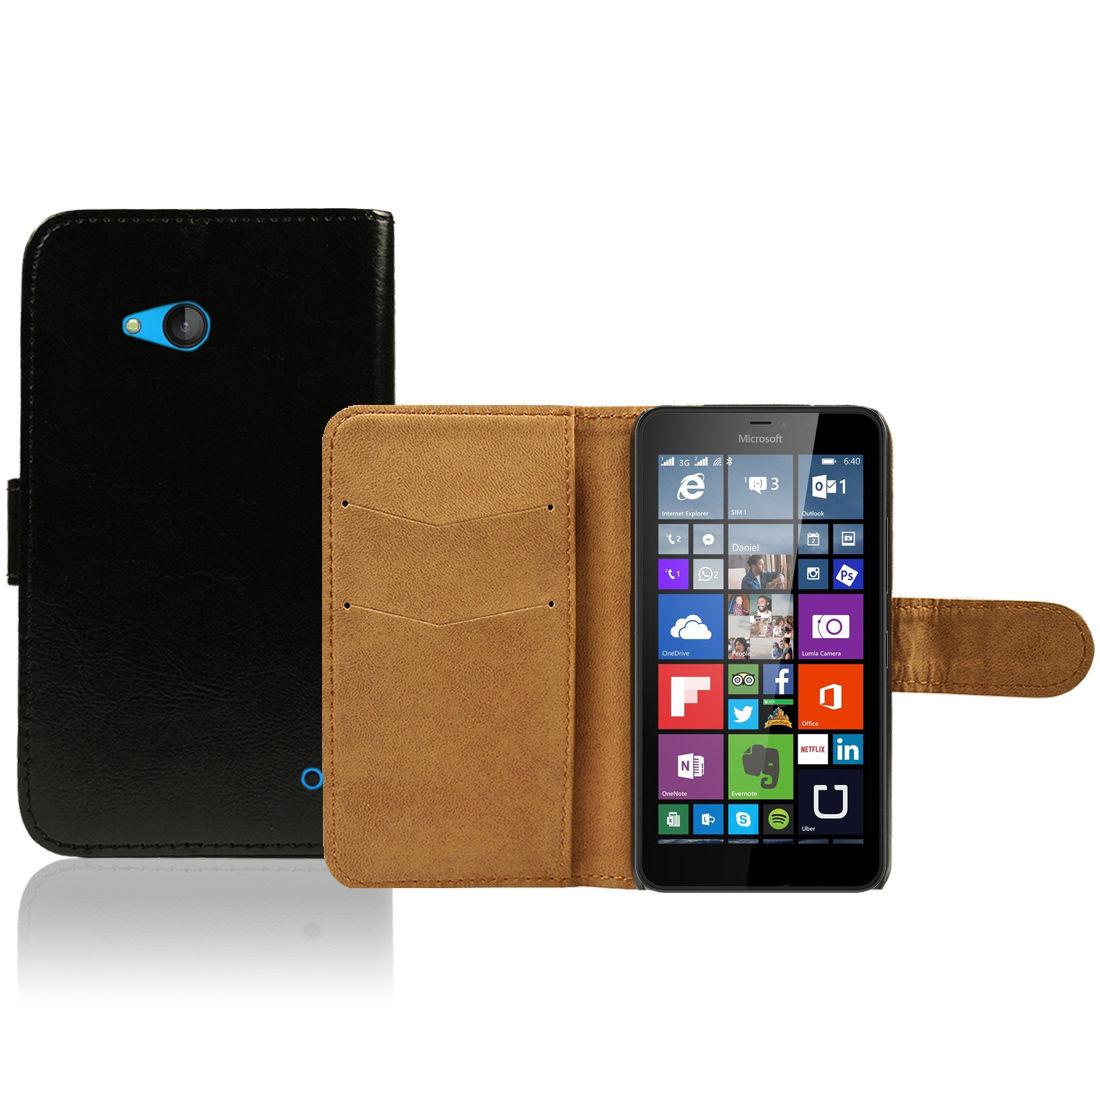 Pouzdro pro Microsoft Lumia 640 černé